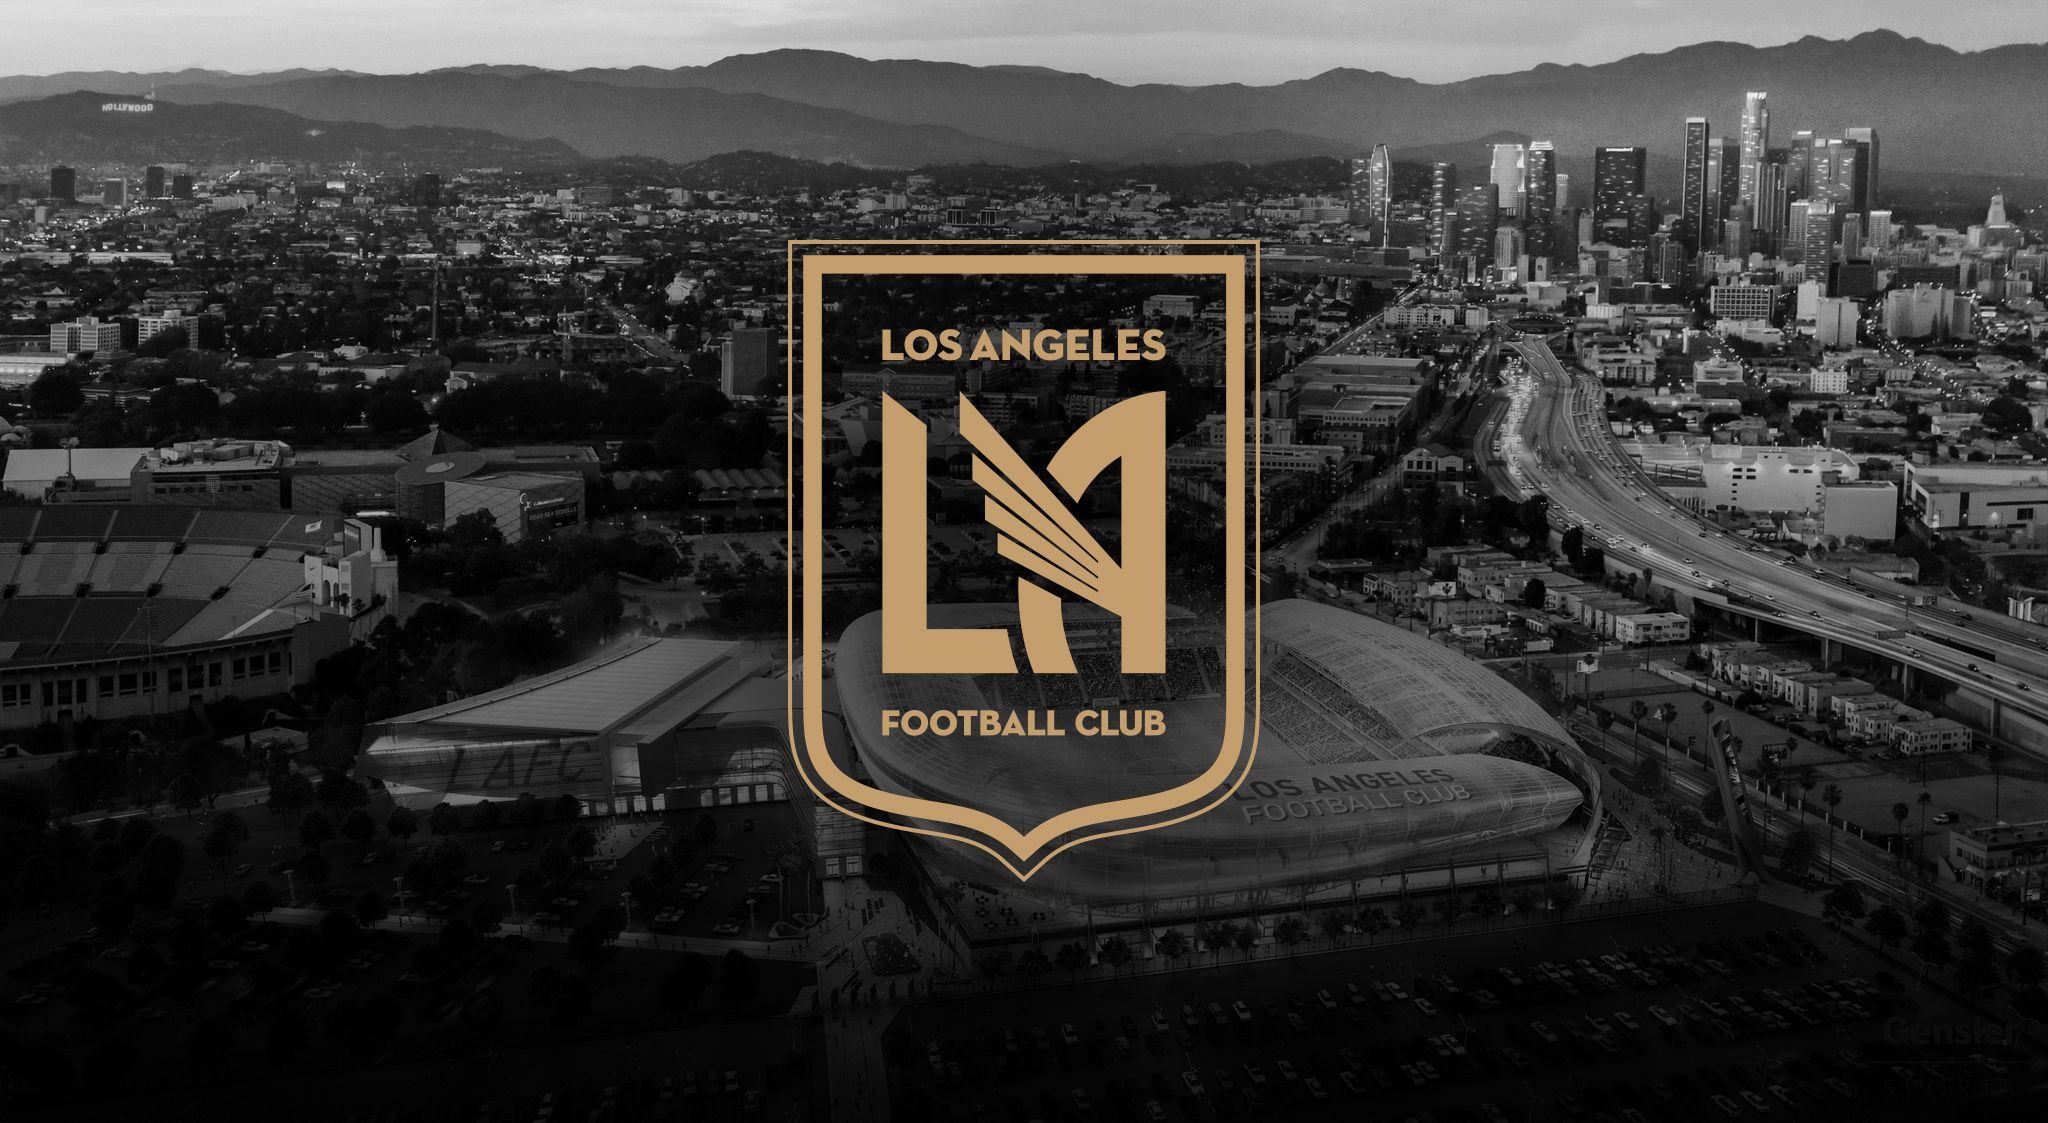 Pin On Los Angeles Football Club